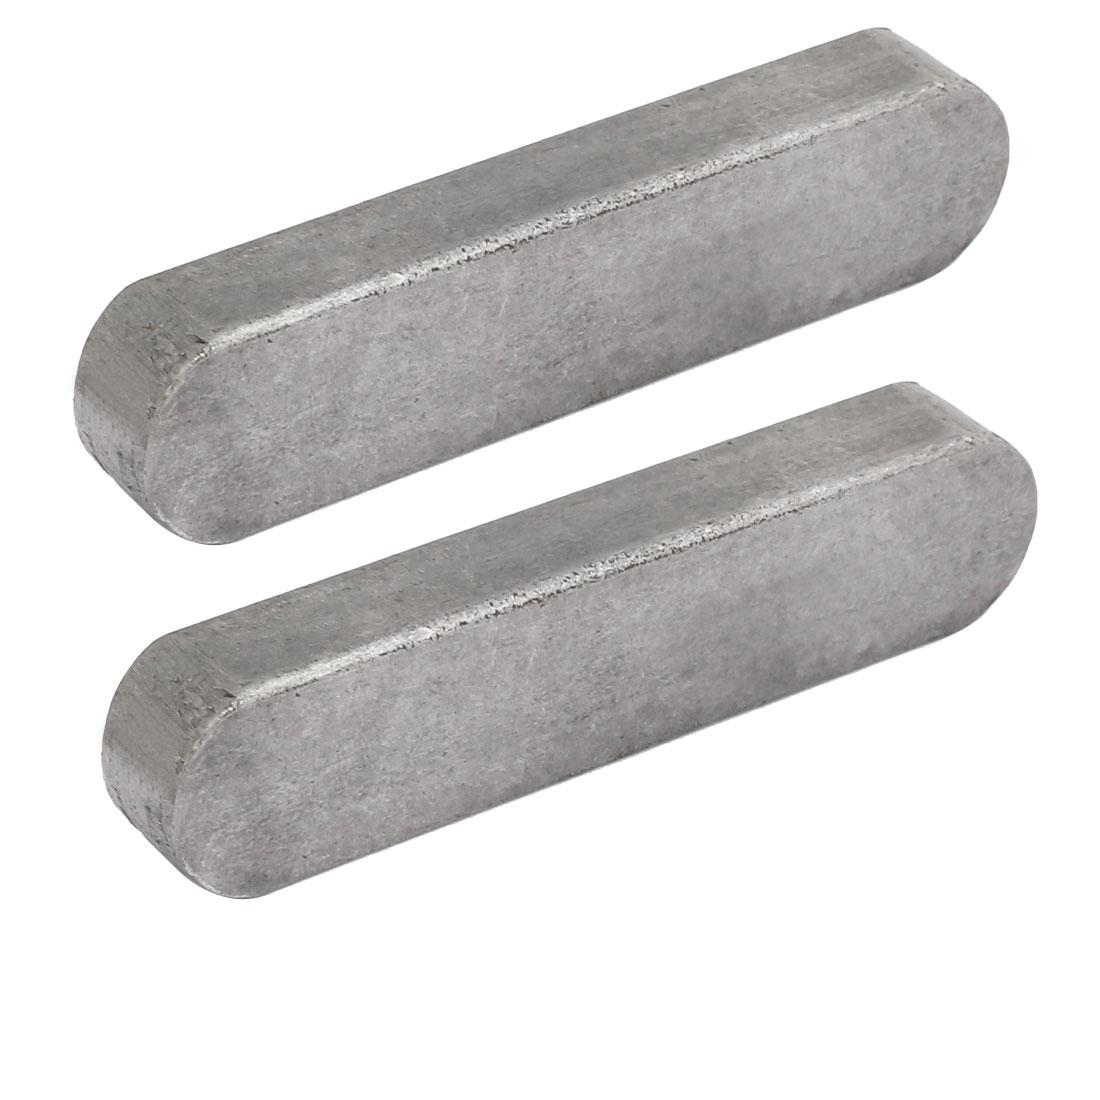 80mmx18mmx11mm Carbon Steel Key Stock To Lock Pulleys 2pcs